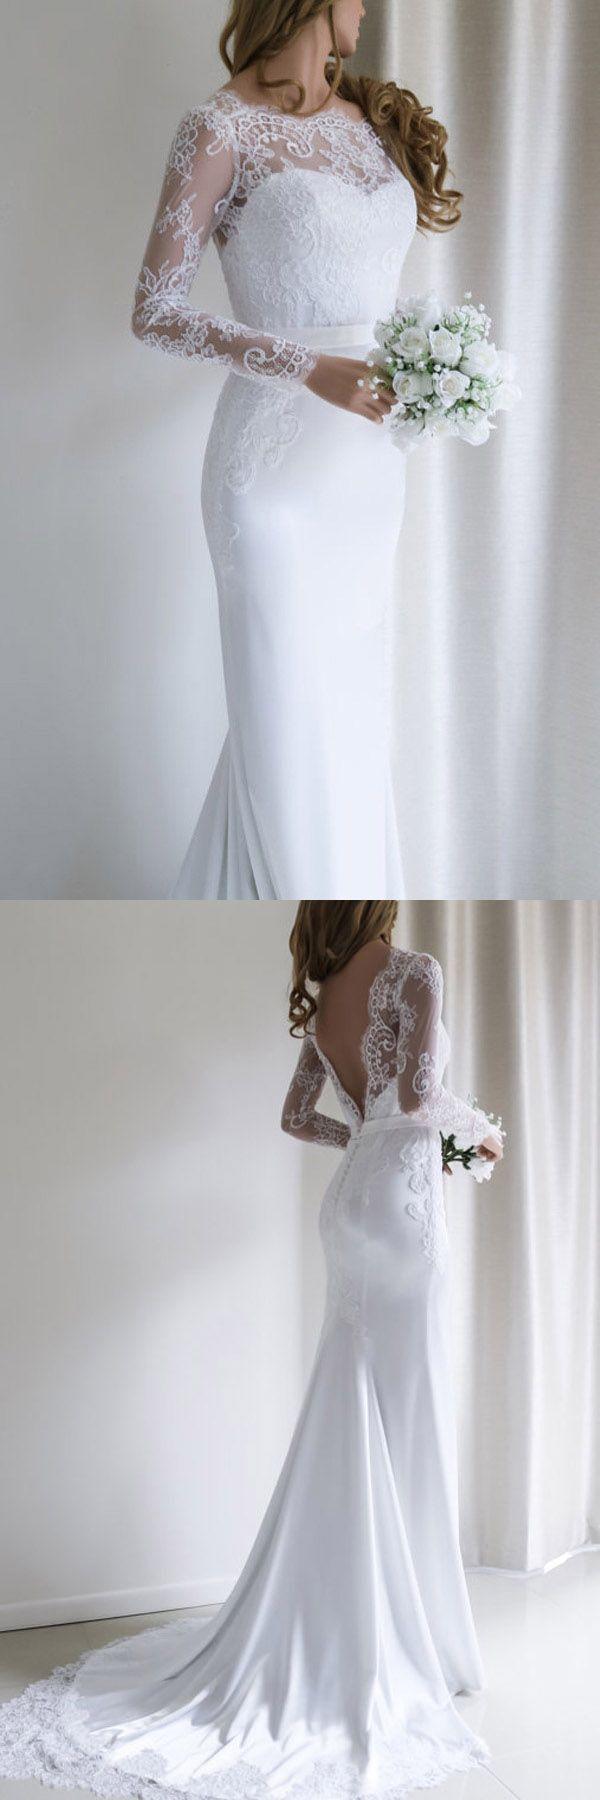 Elegant lace long sleeves mermaid white long wedding dress with